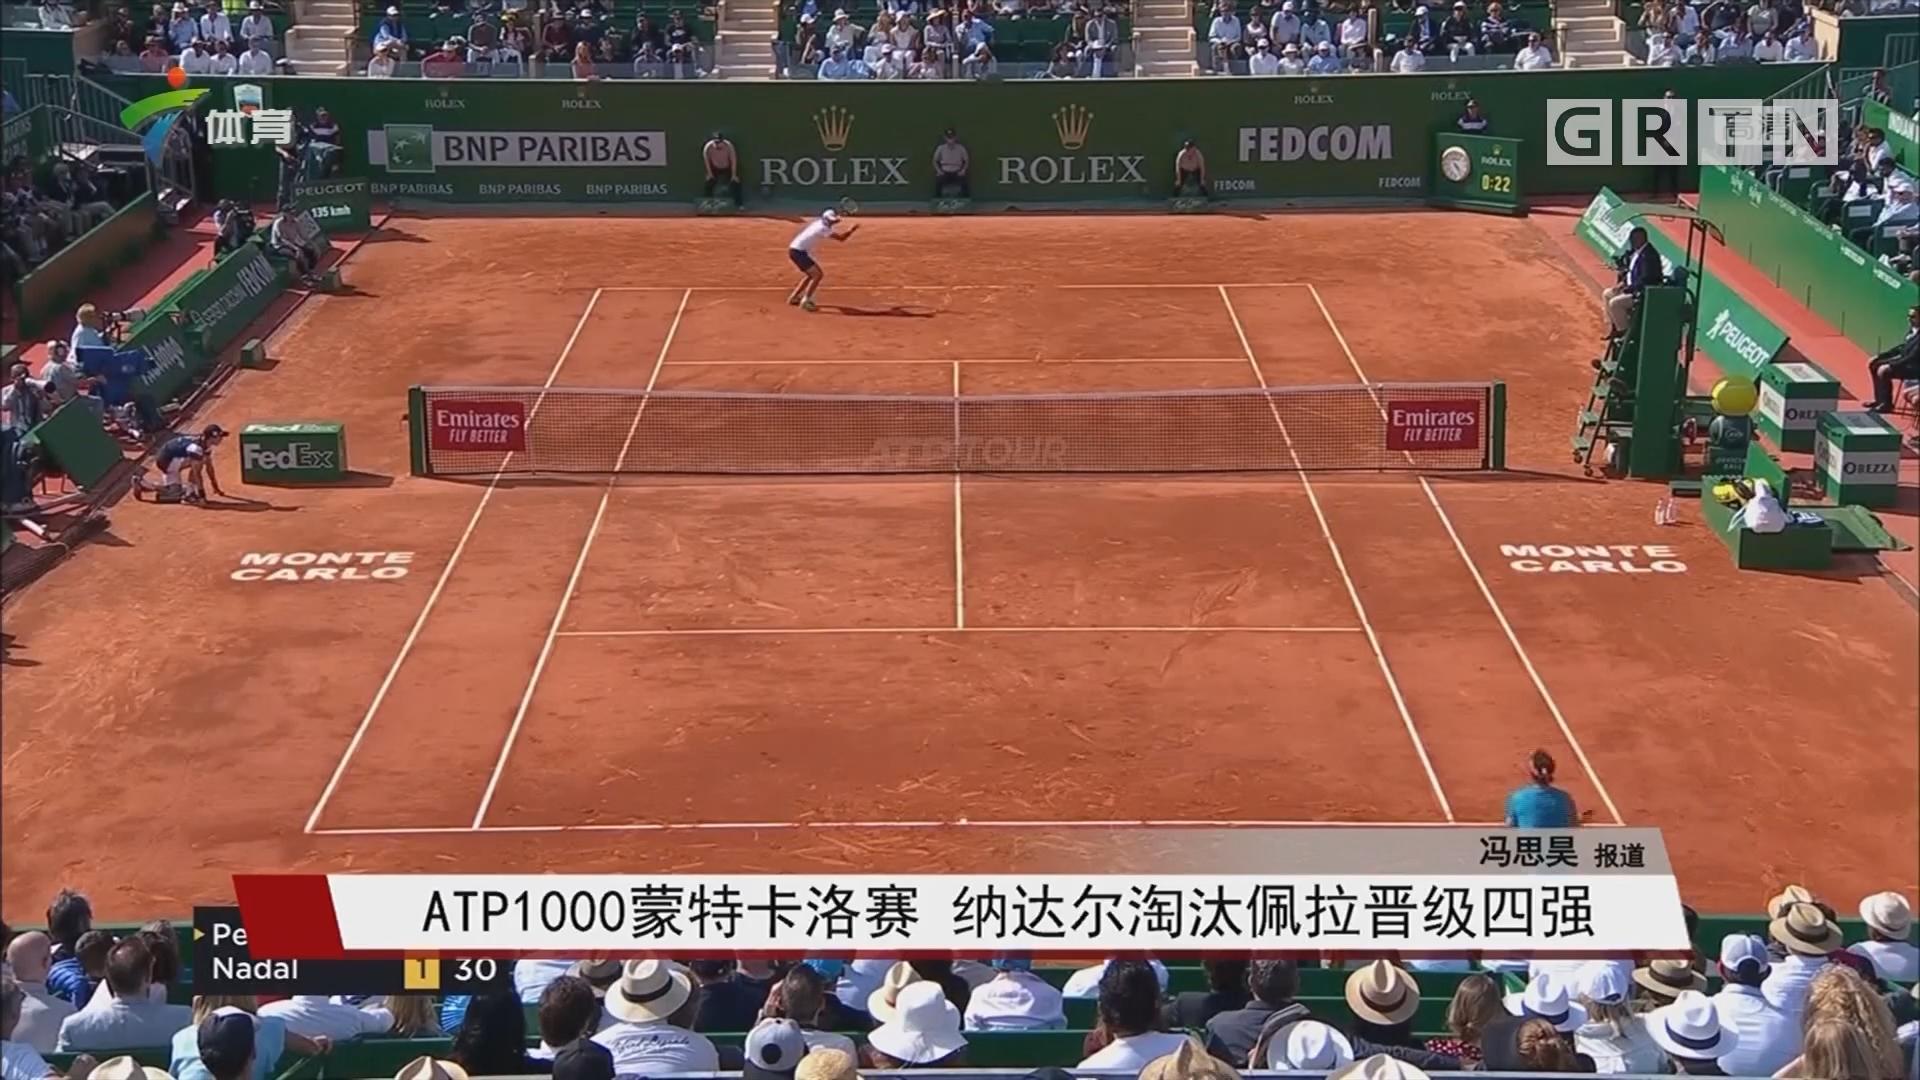 ATP1000蒙特卡洛赛 纳达尔淘汰佩拉晋级四强